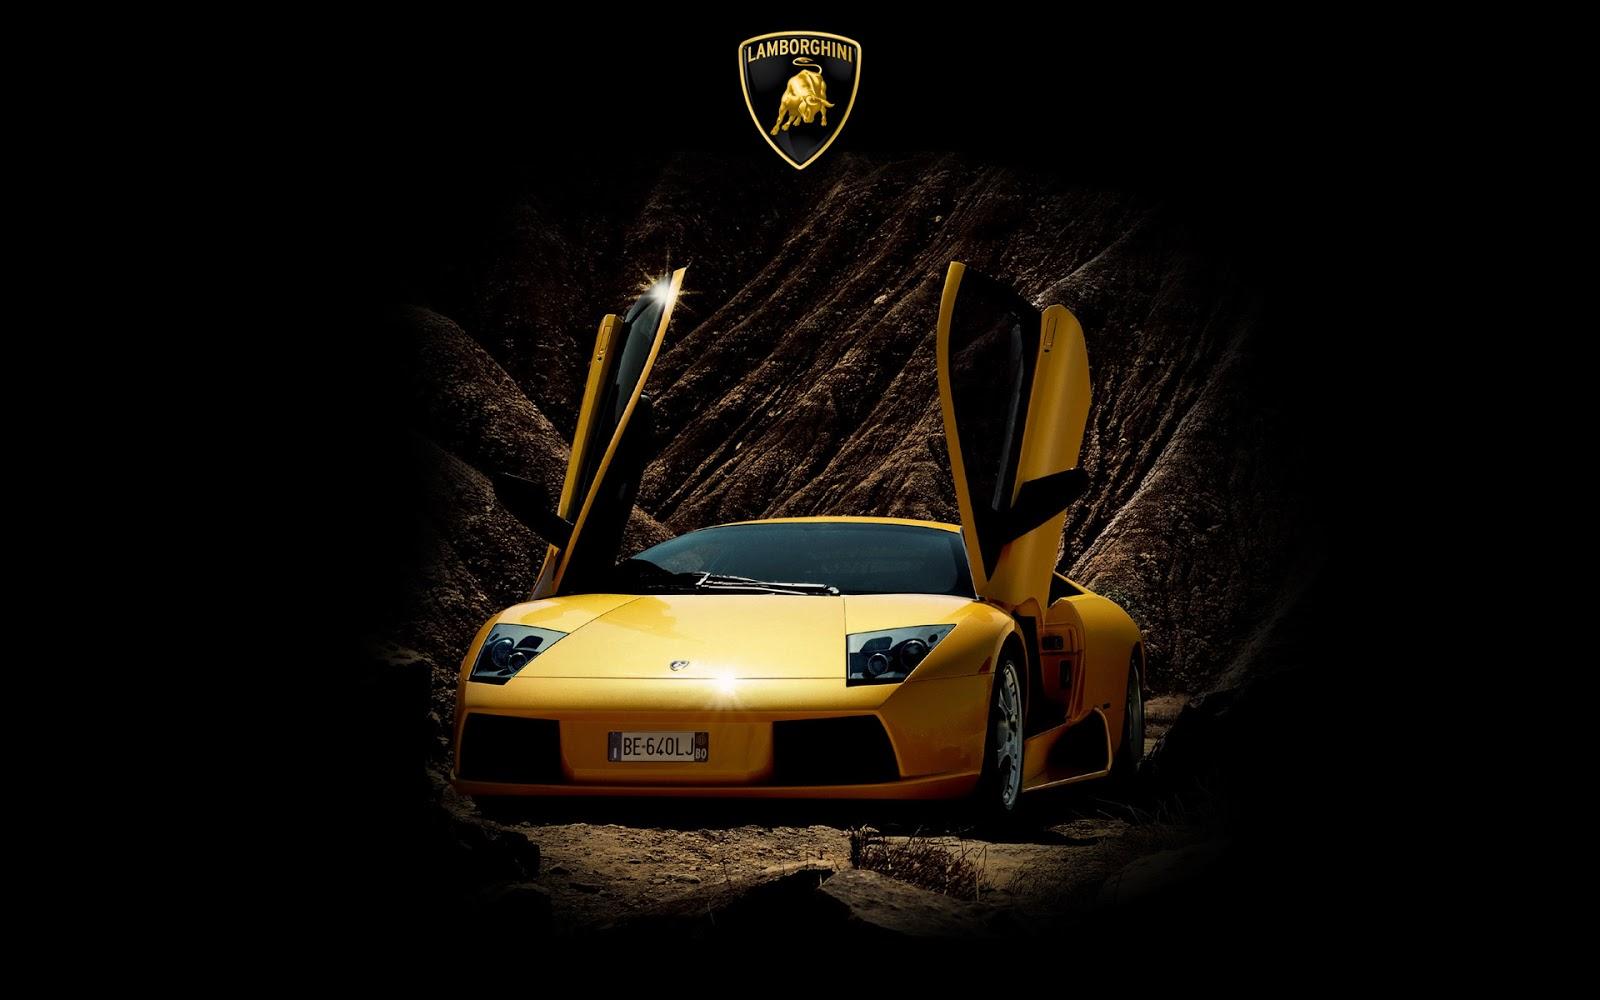 Awesome Yellow Lamborghini Wallpapers HD